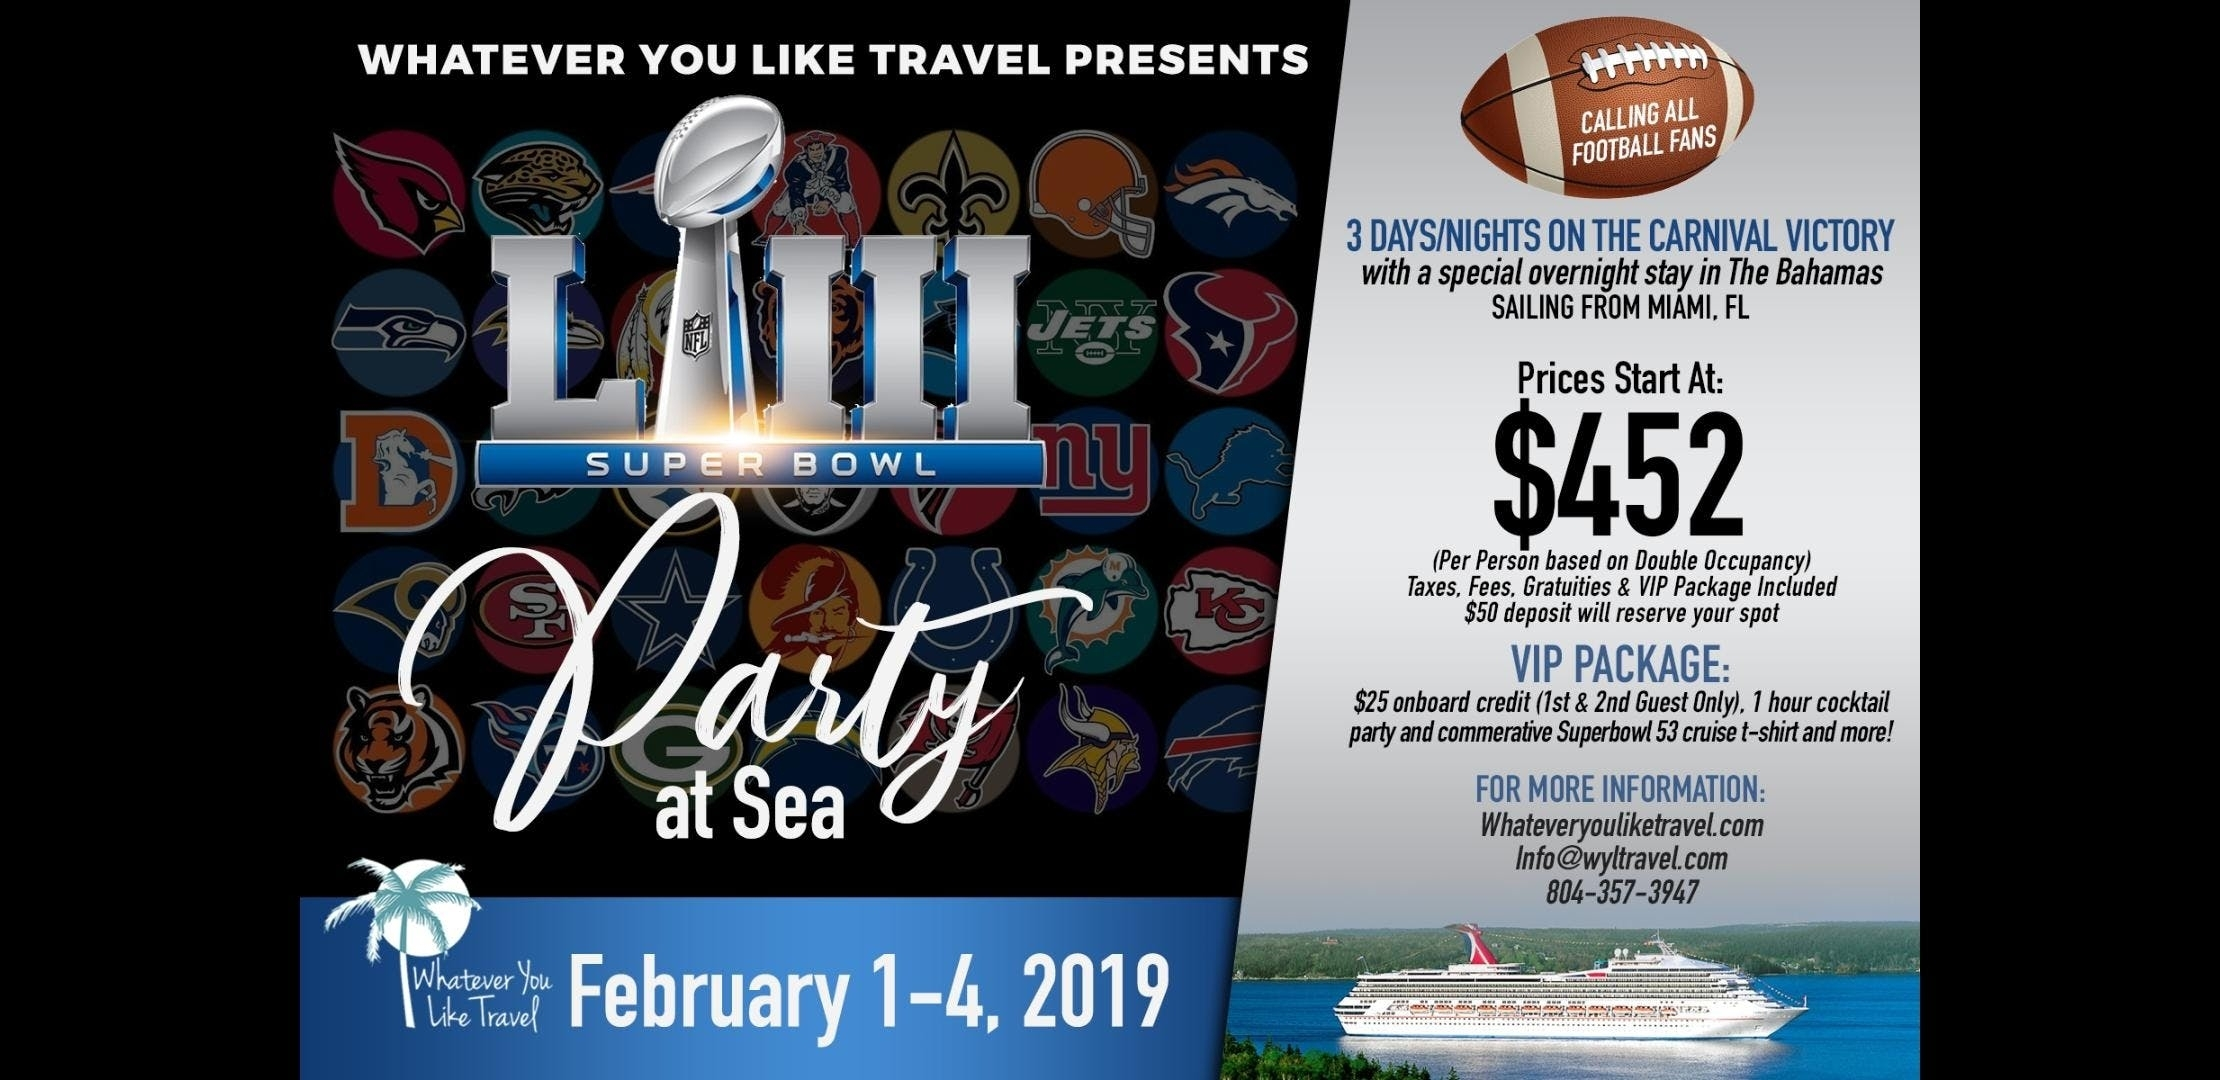 Superbowl Party At Sea, Miami Fl - Feb 1, 2019 - 4:00 Pm throughout Super Bowl Miami 2019